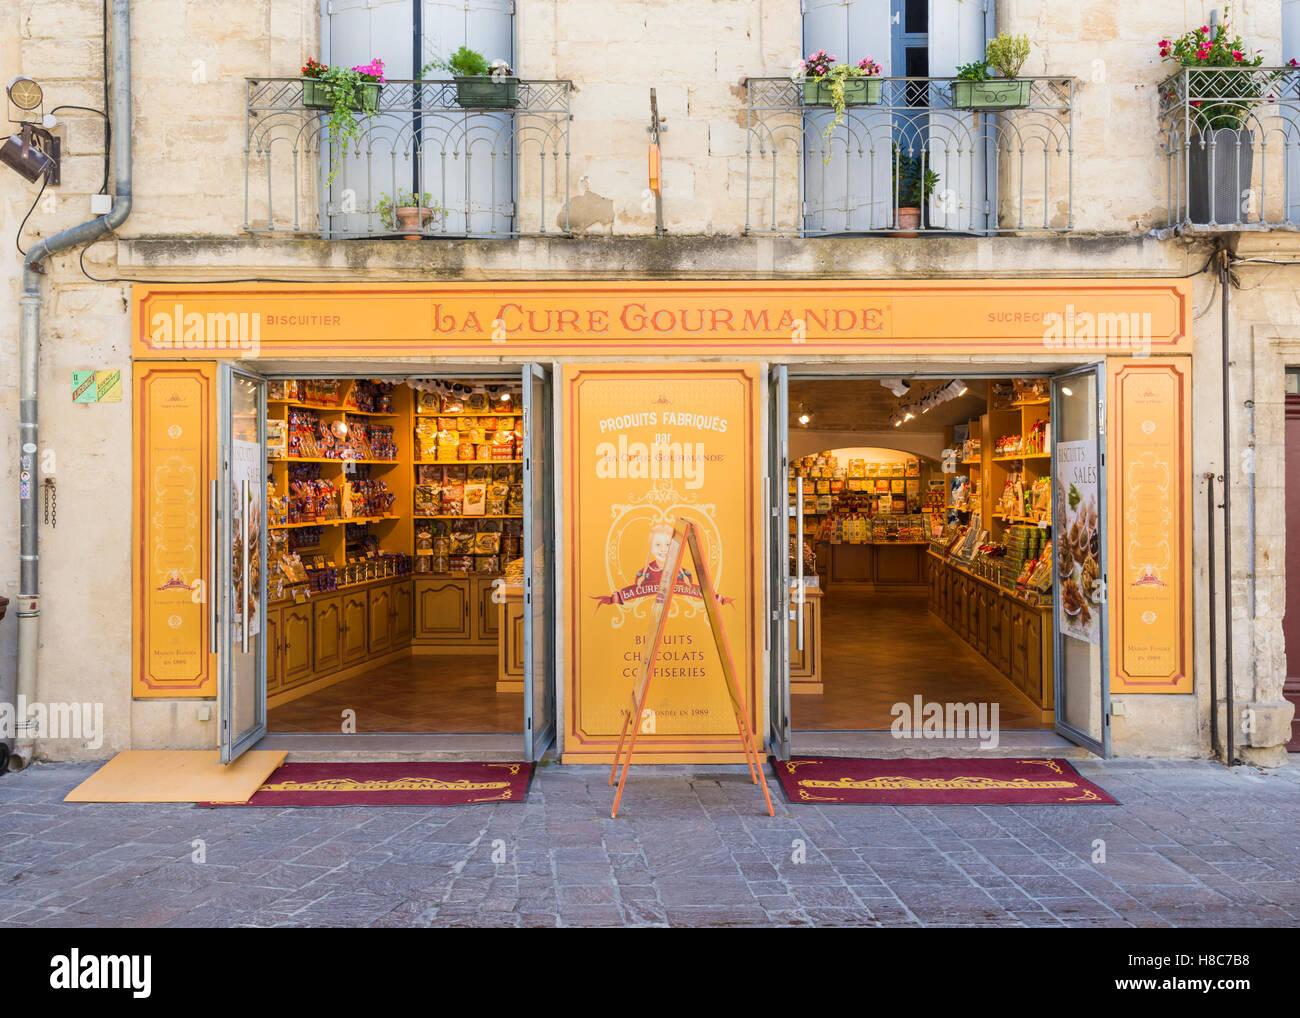 La Cure Gourmande Shop Fassade in der Stadt Uzès, Gard, Frankreich Stockbild